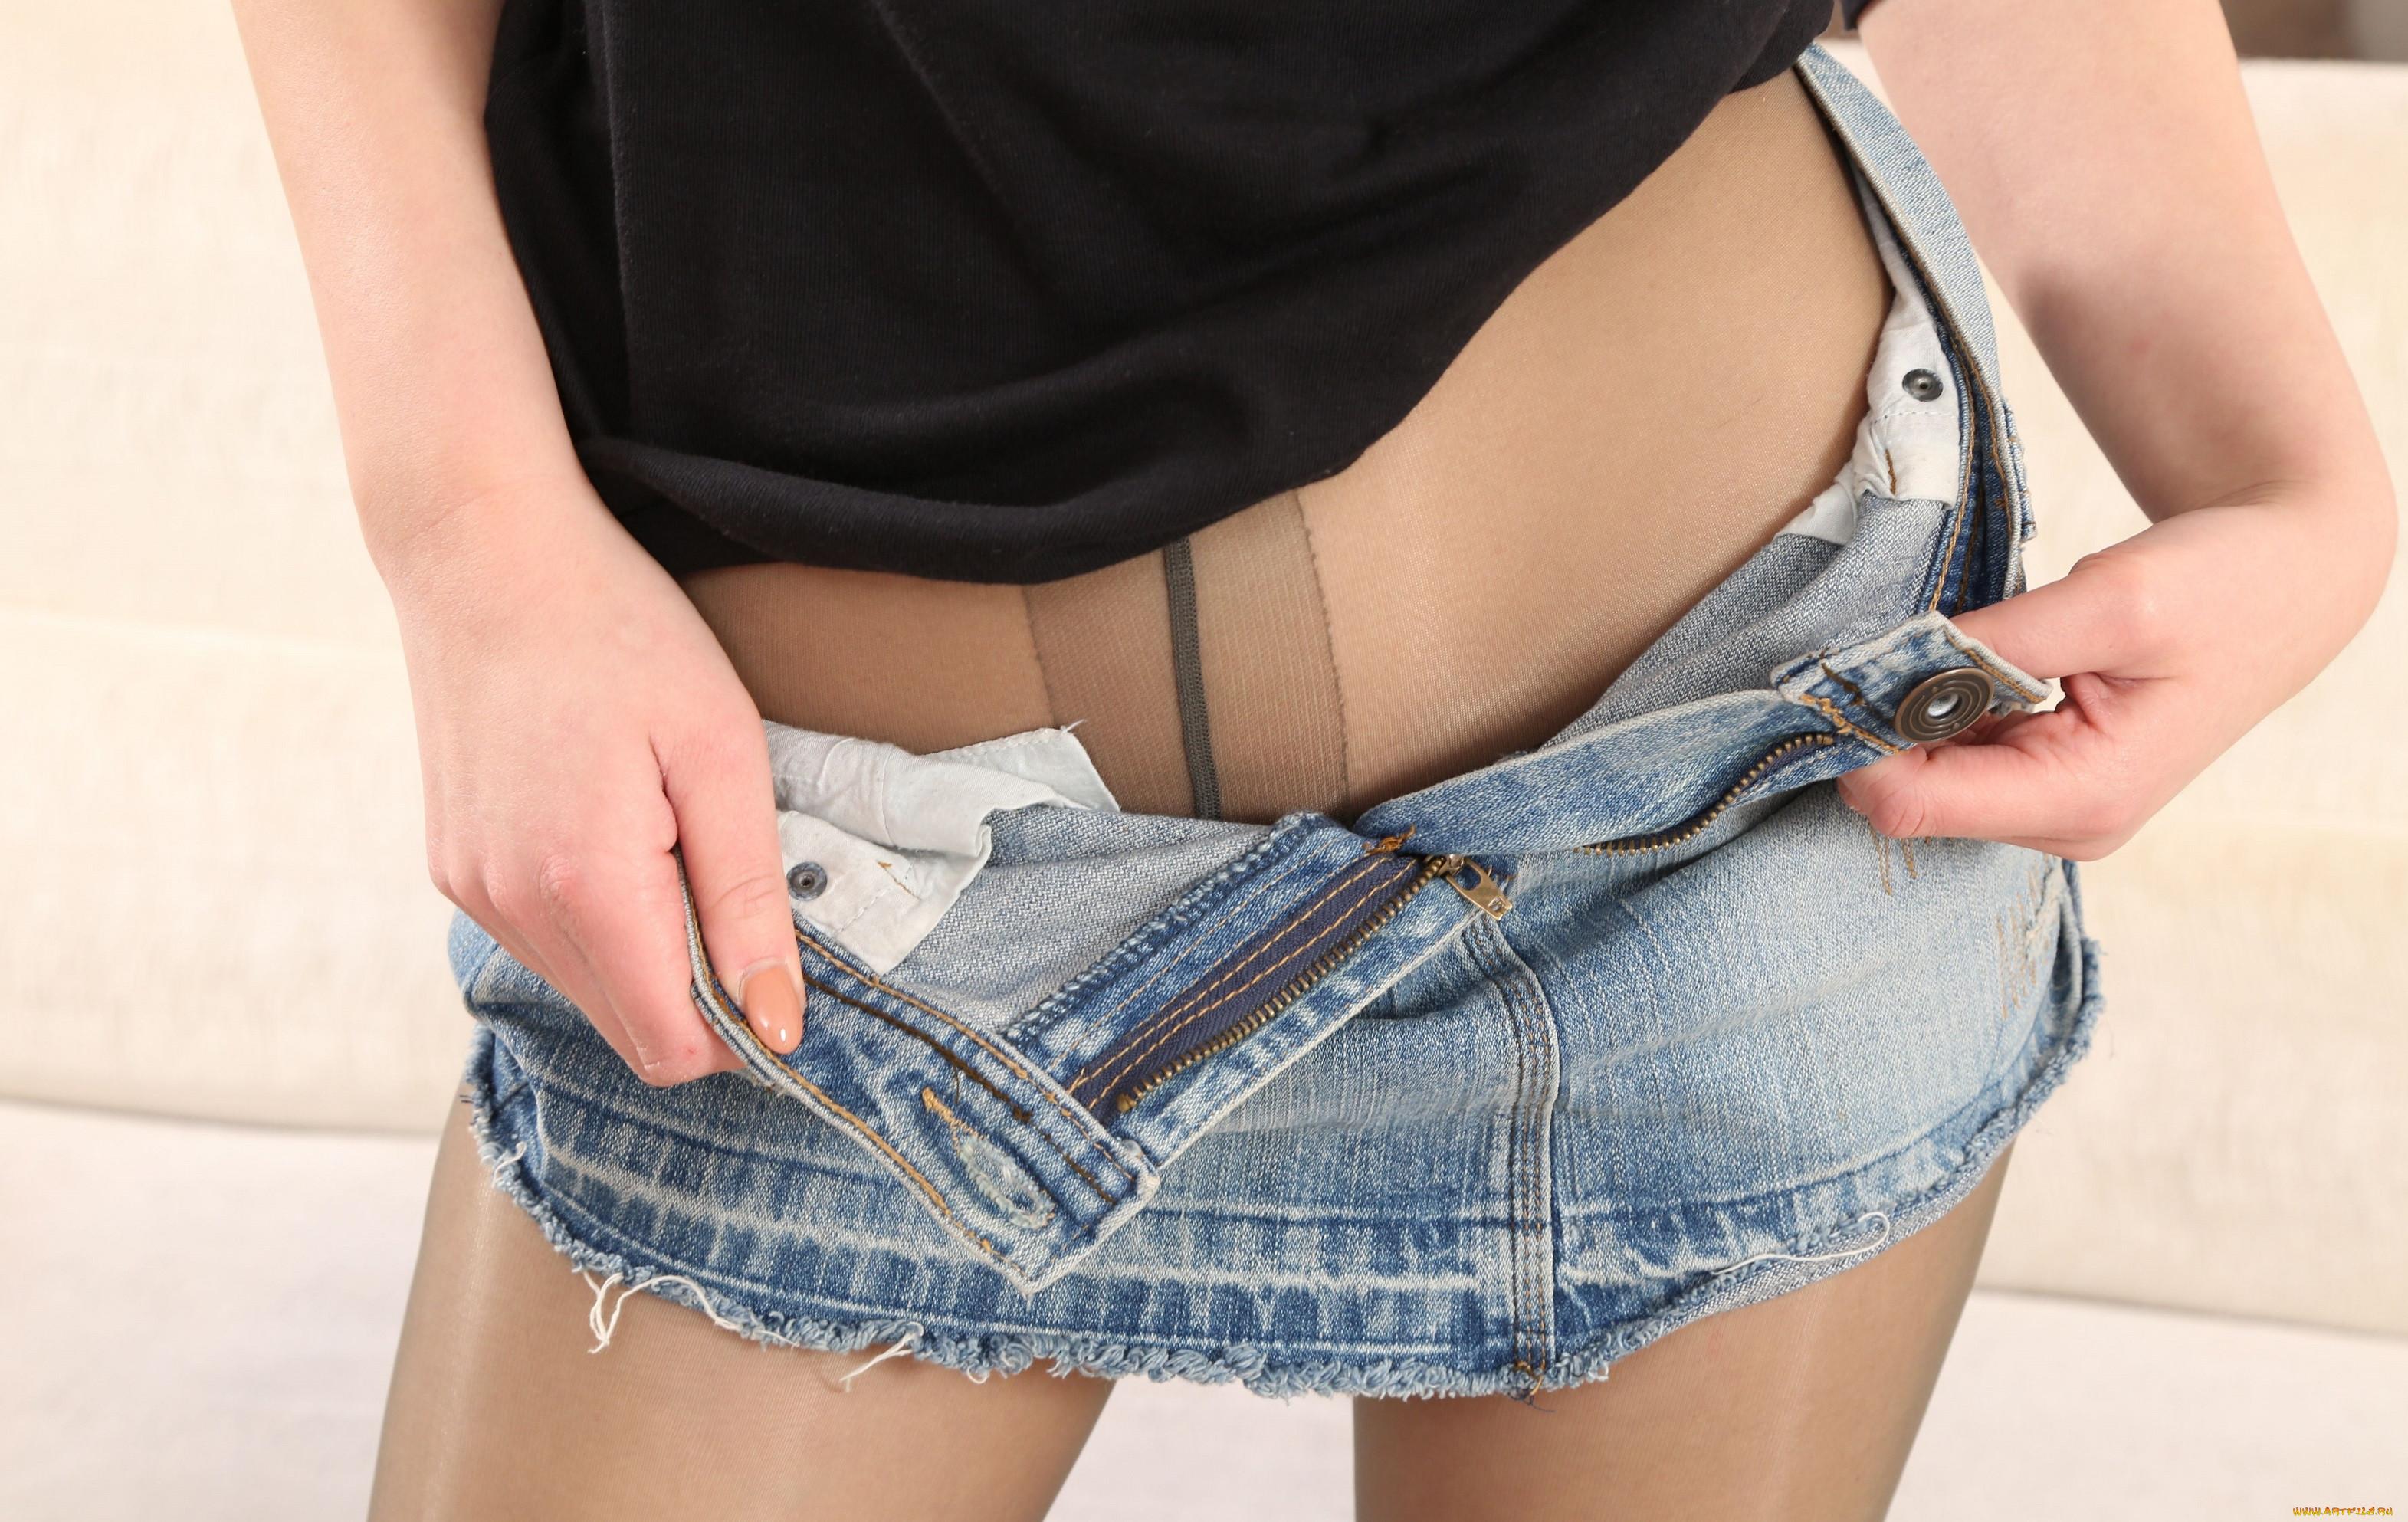 Фото под джинсами трусики меня